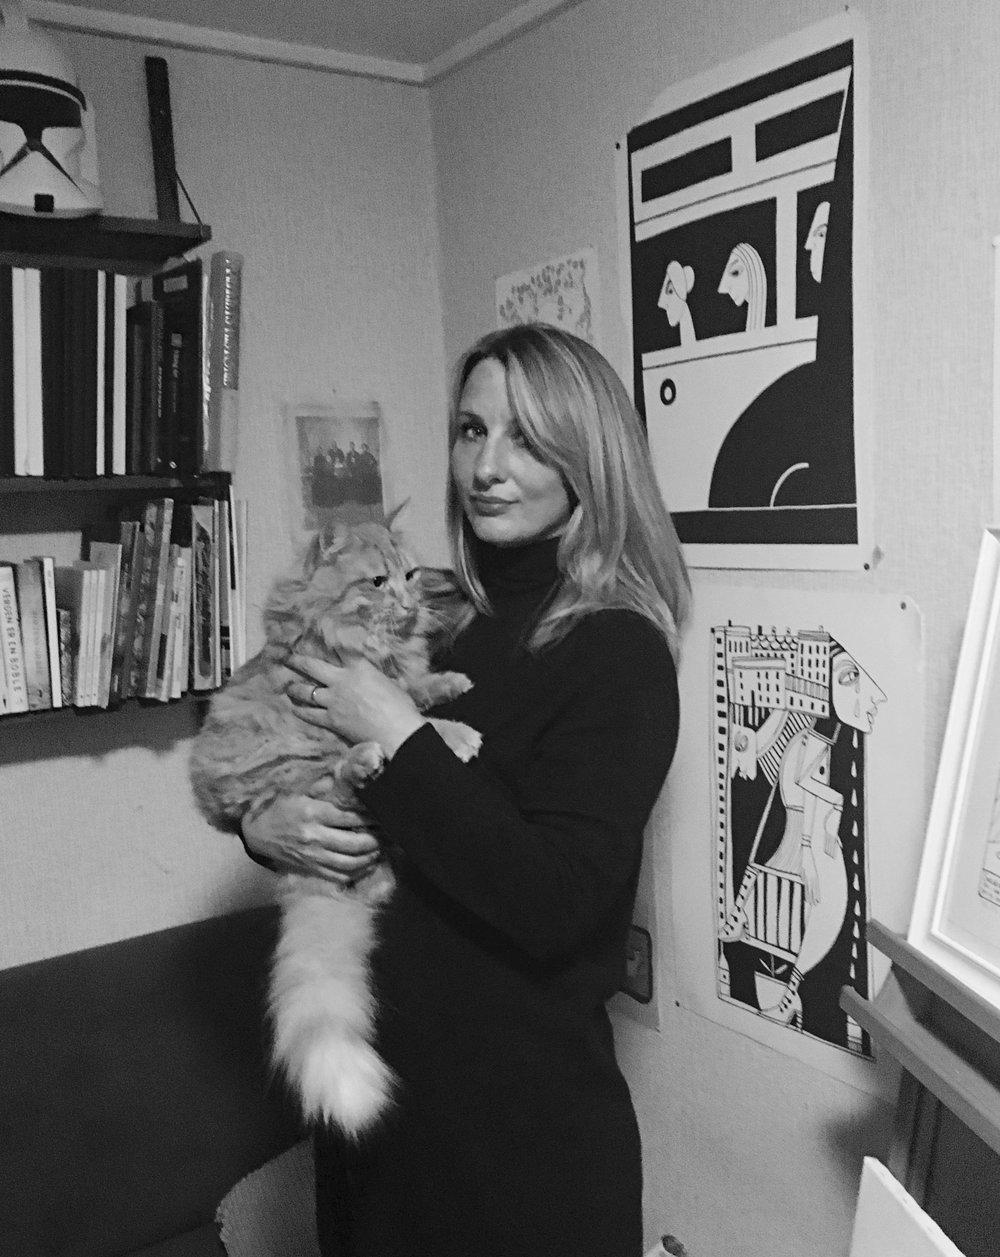 Tora i stegnestudioet // Tora in her studio